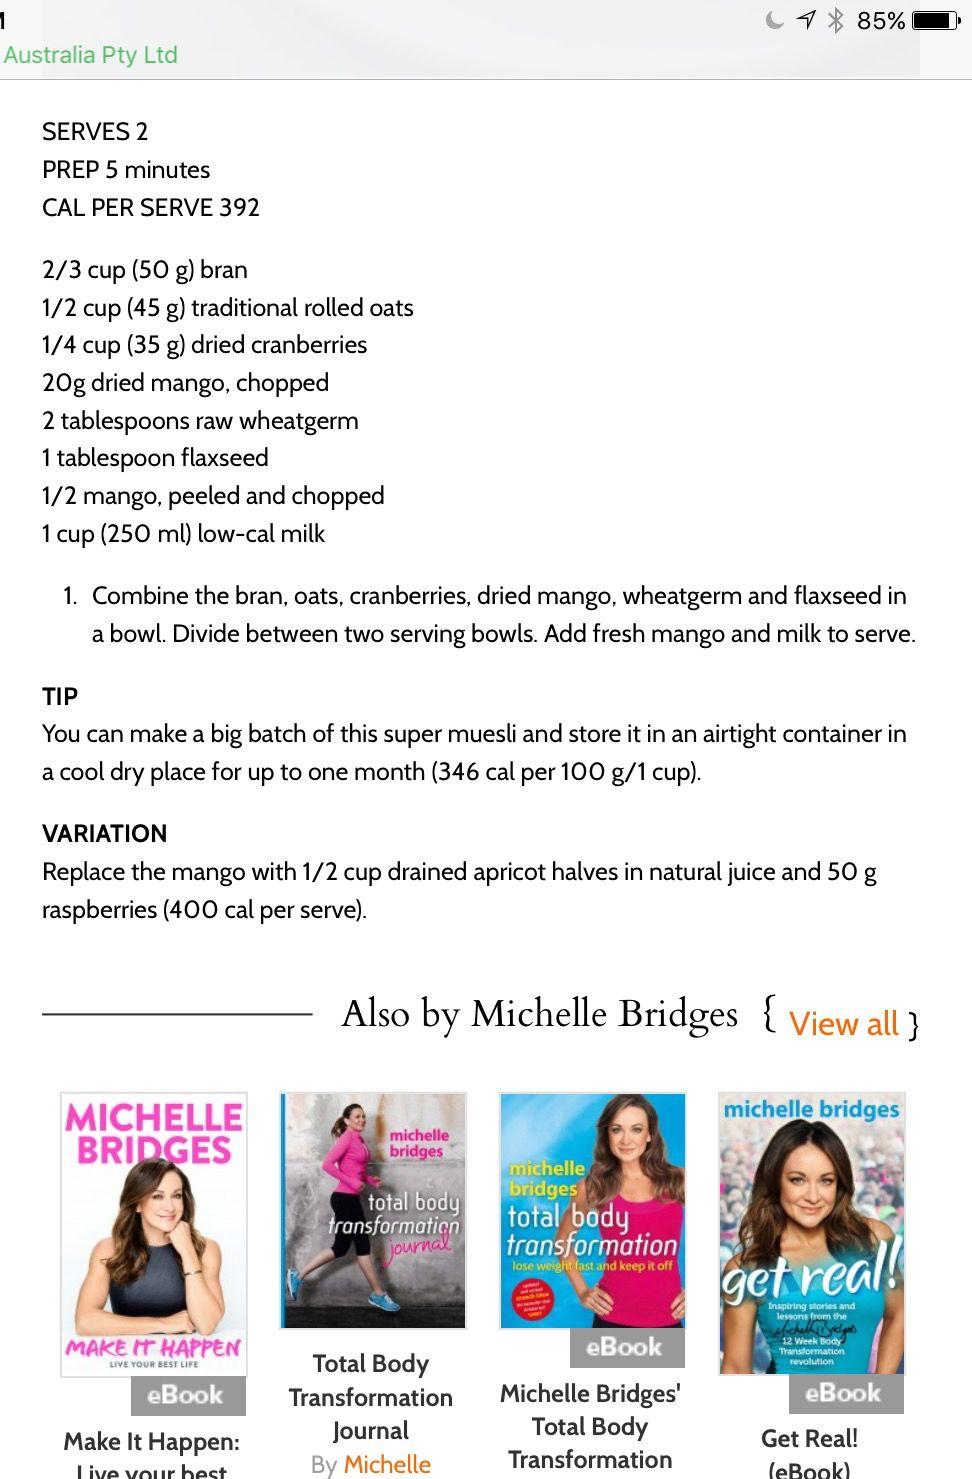 Michelle Bridges Ebook